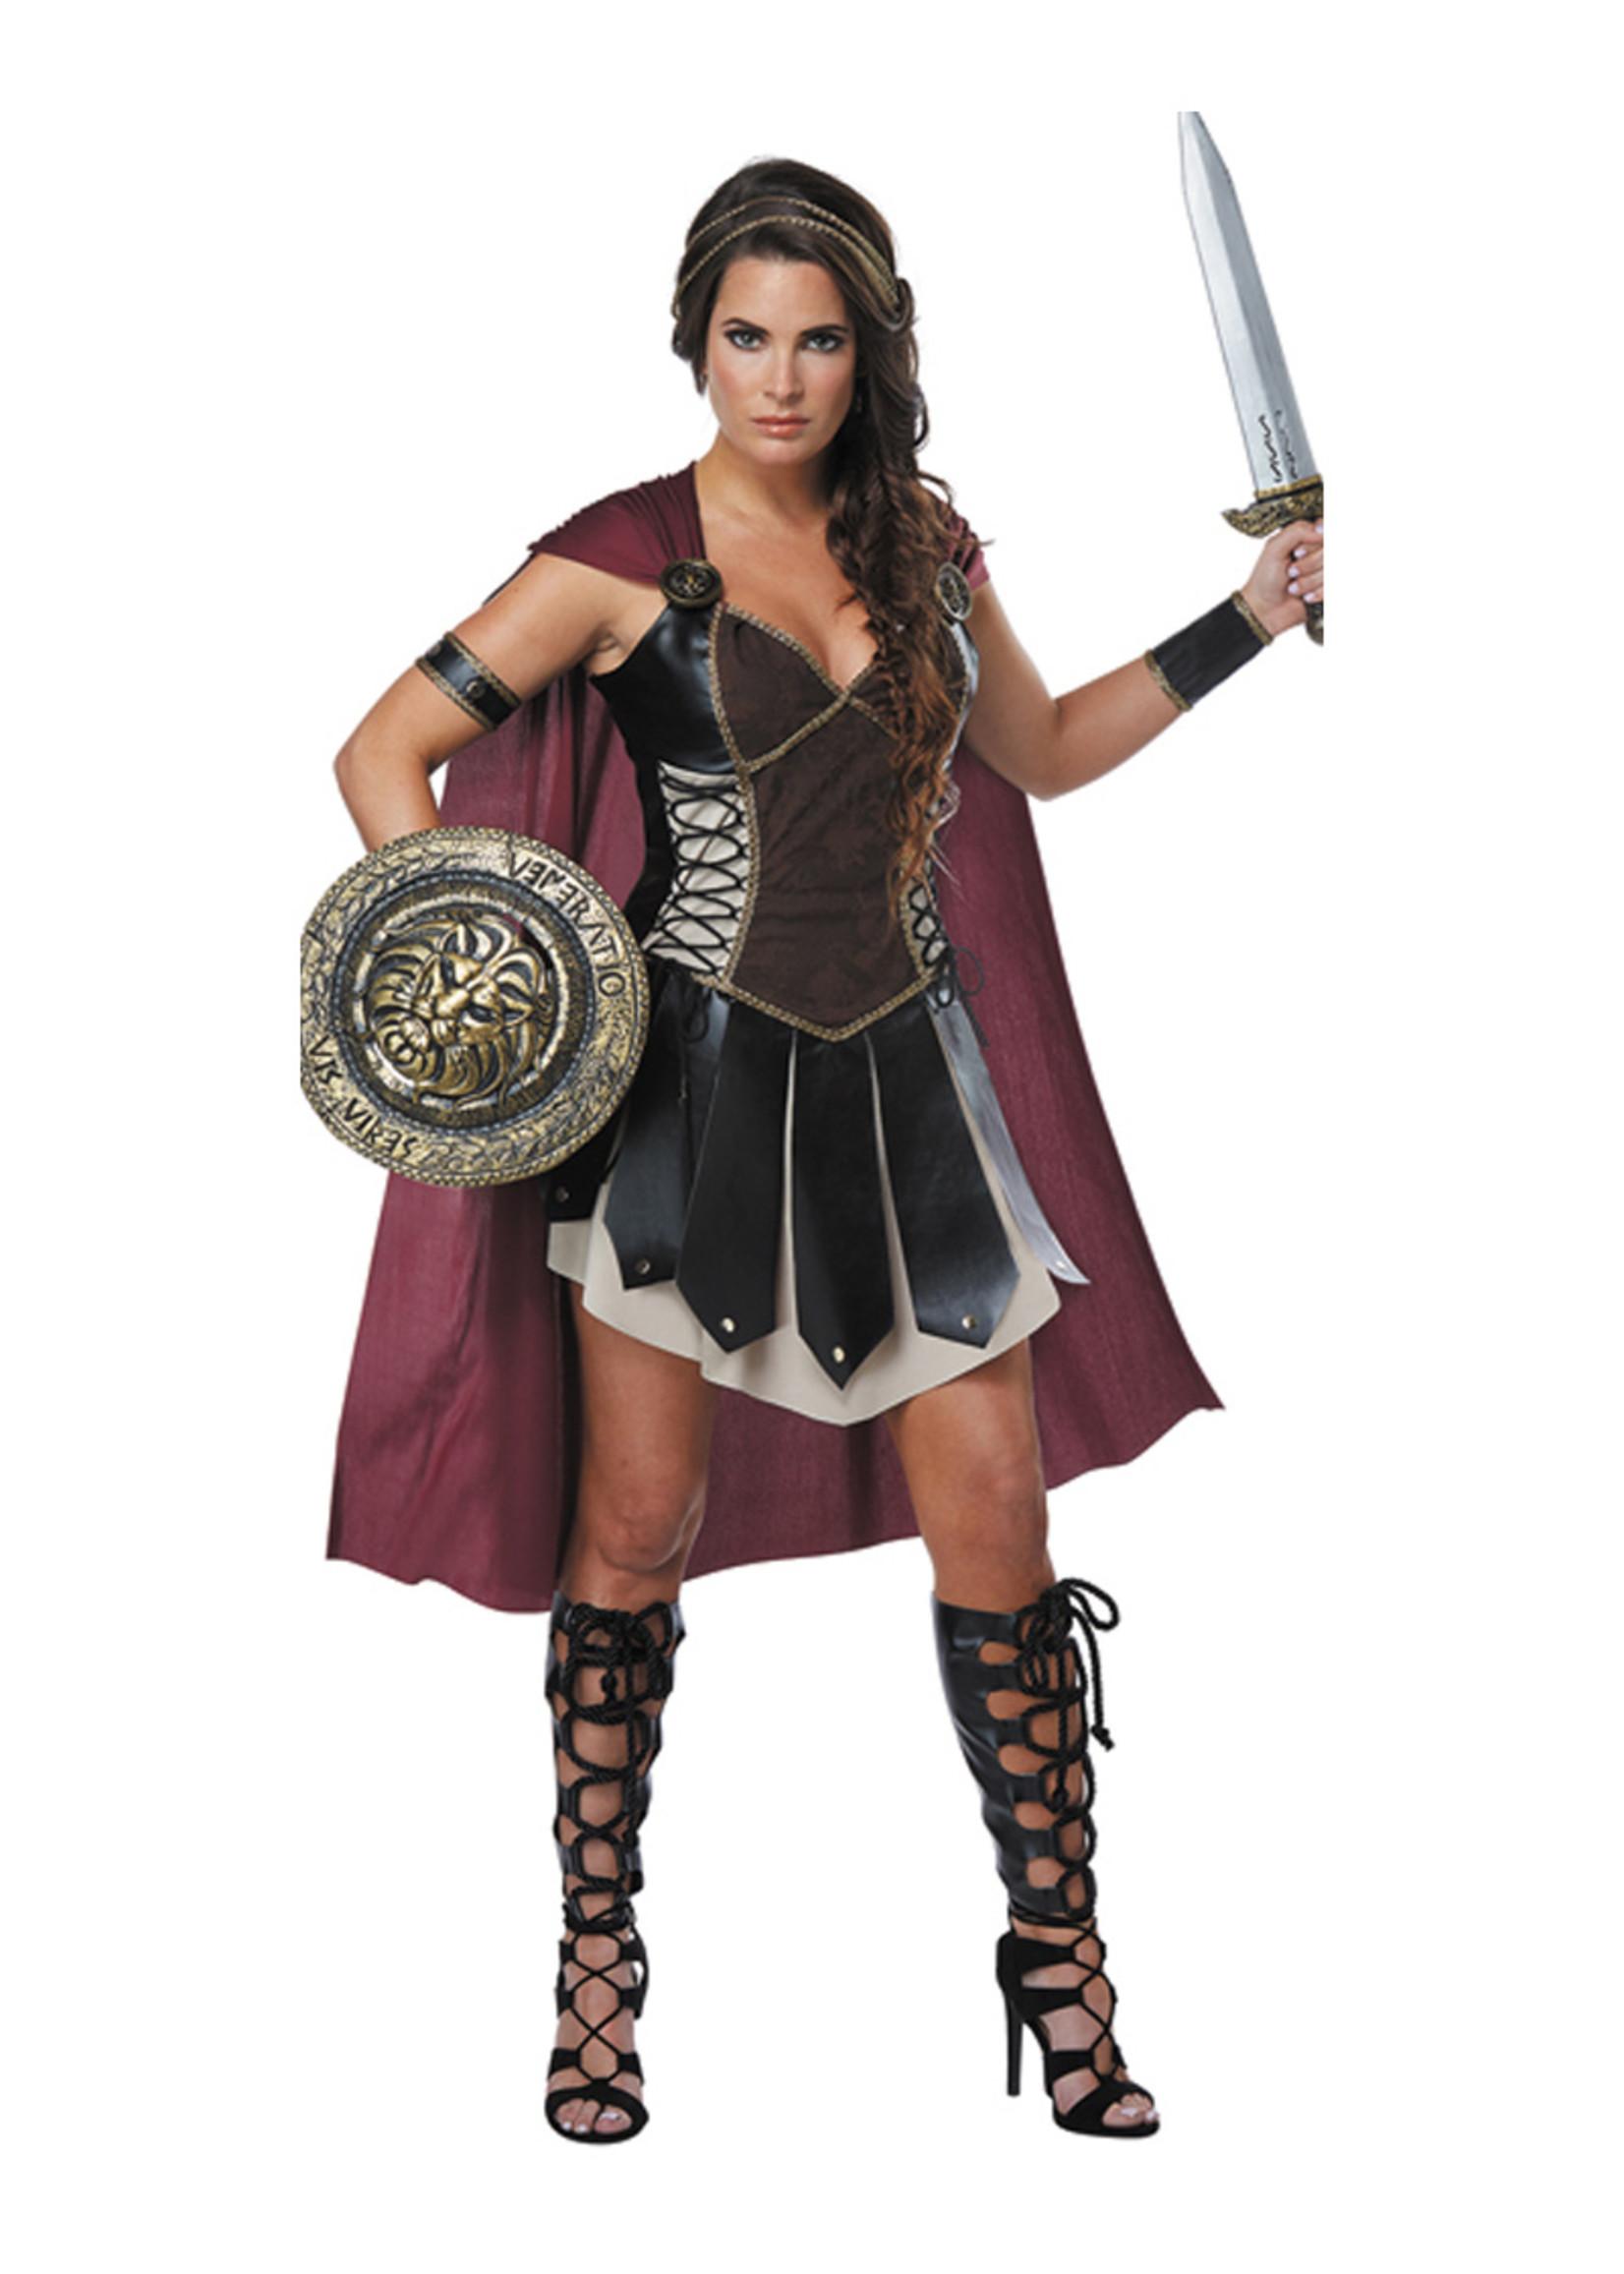 Glorious Gladiator Costume - Women's